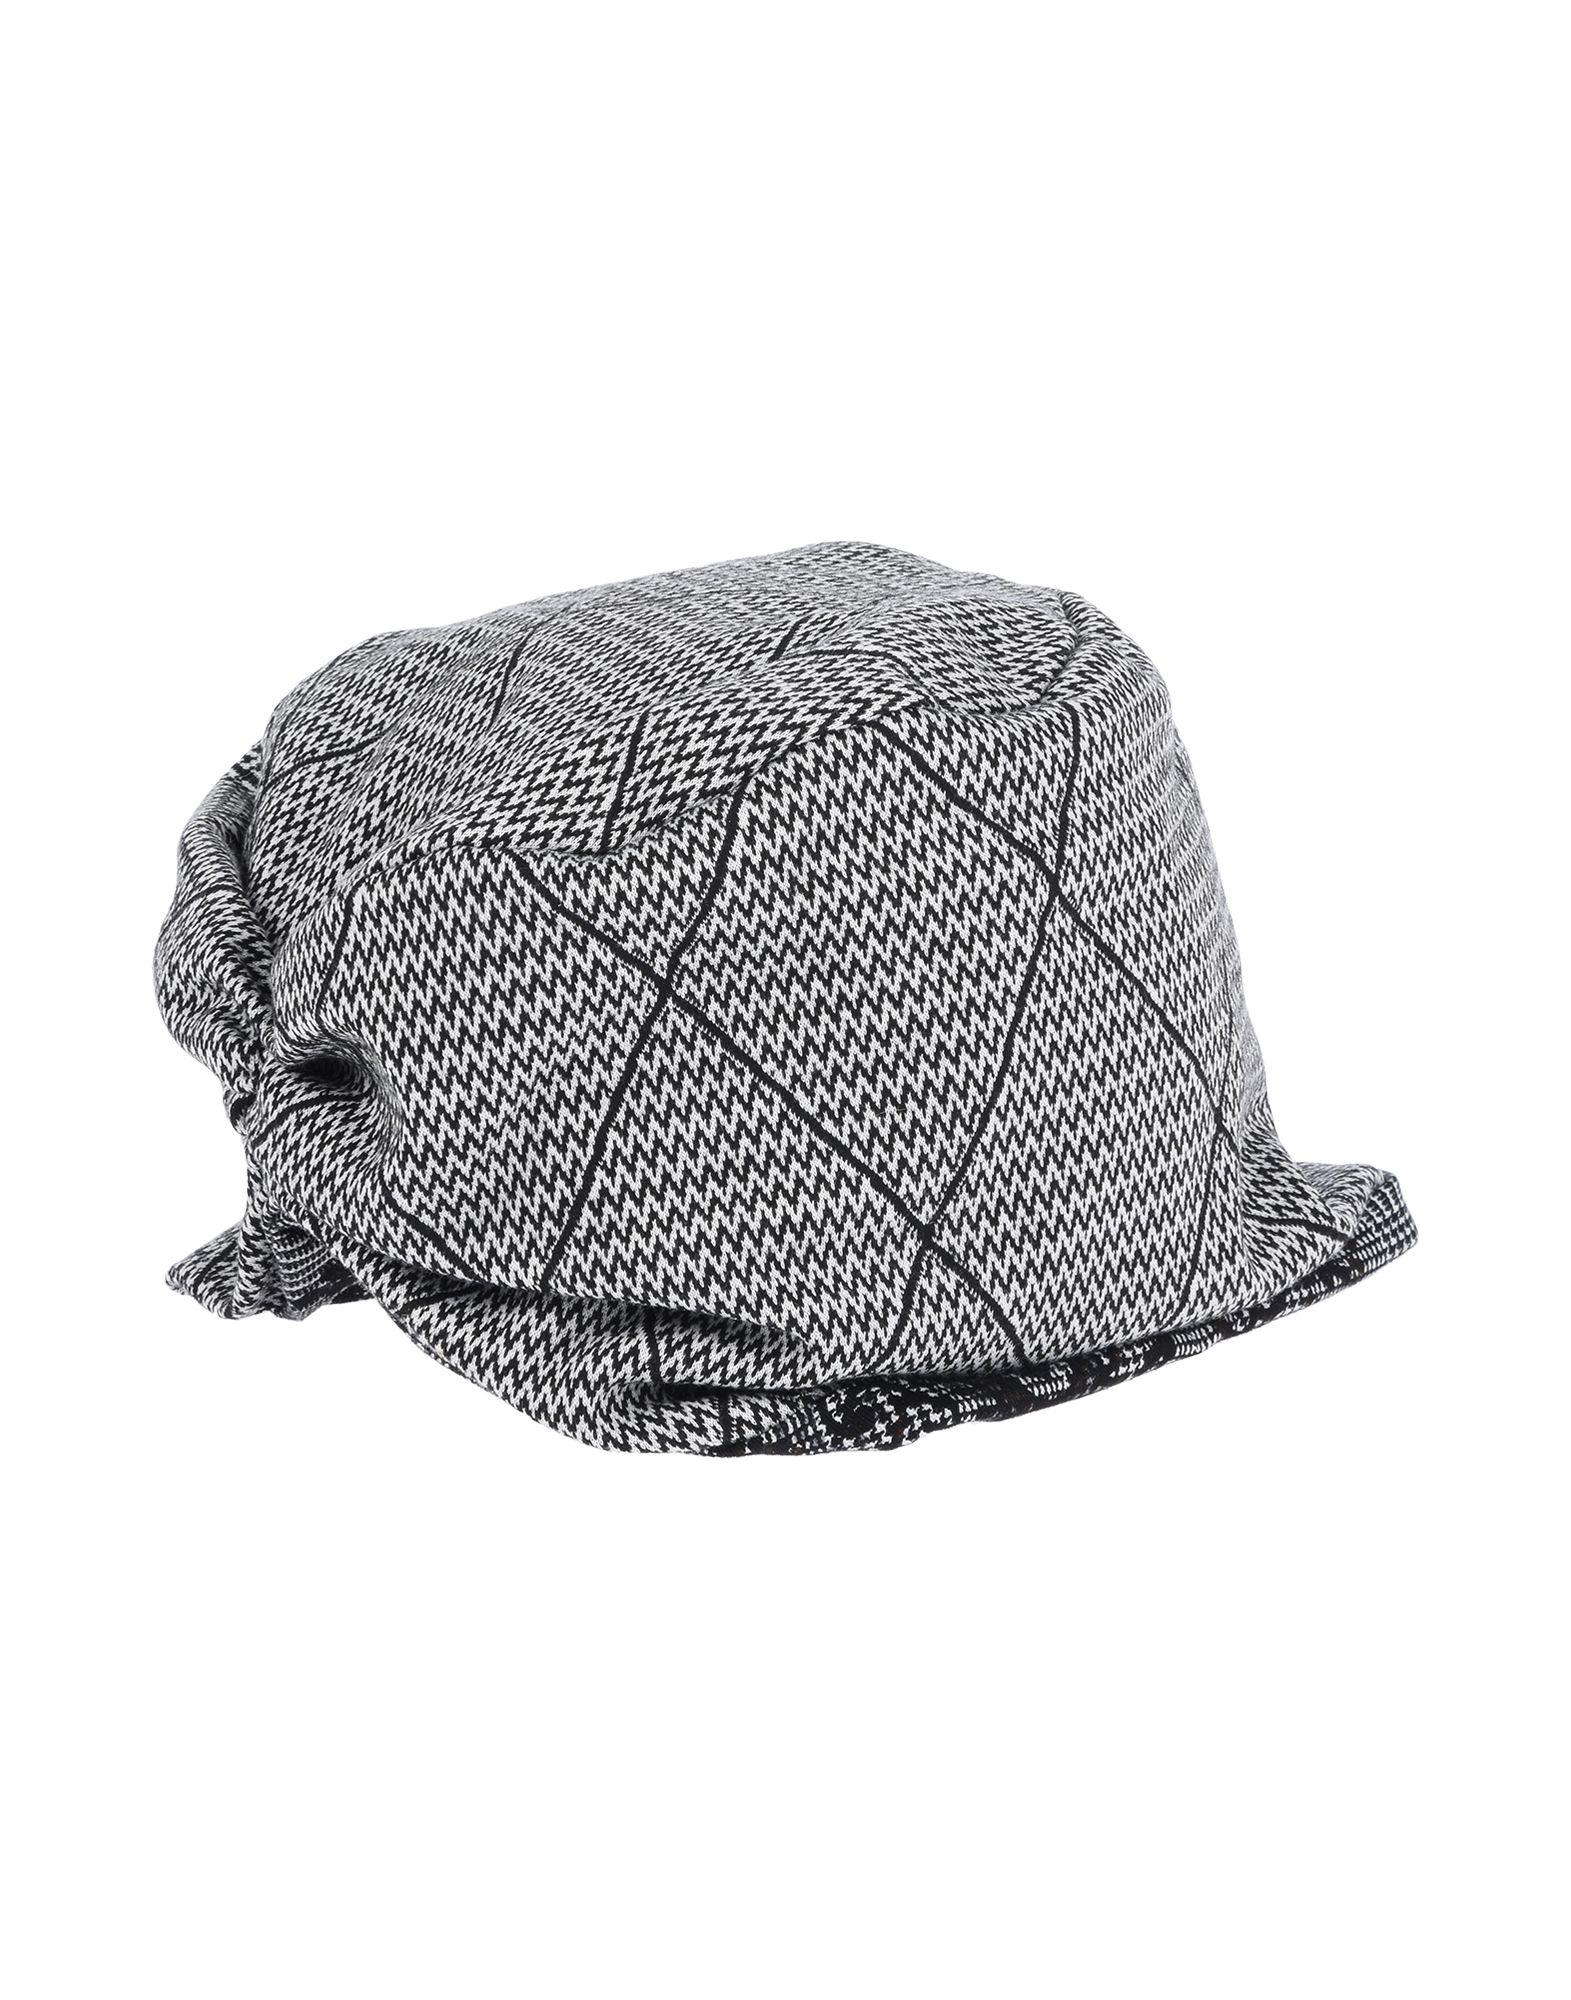 ebcb6d0e9bf Mhudi Hat - Women Mhudi Hats online on YOOX Finland - 46628737QH